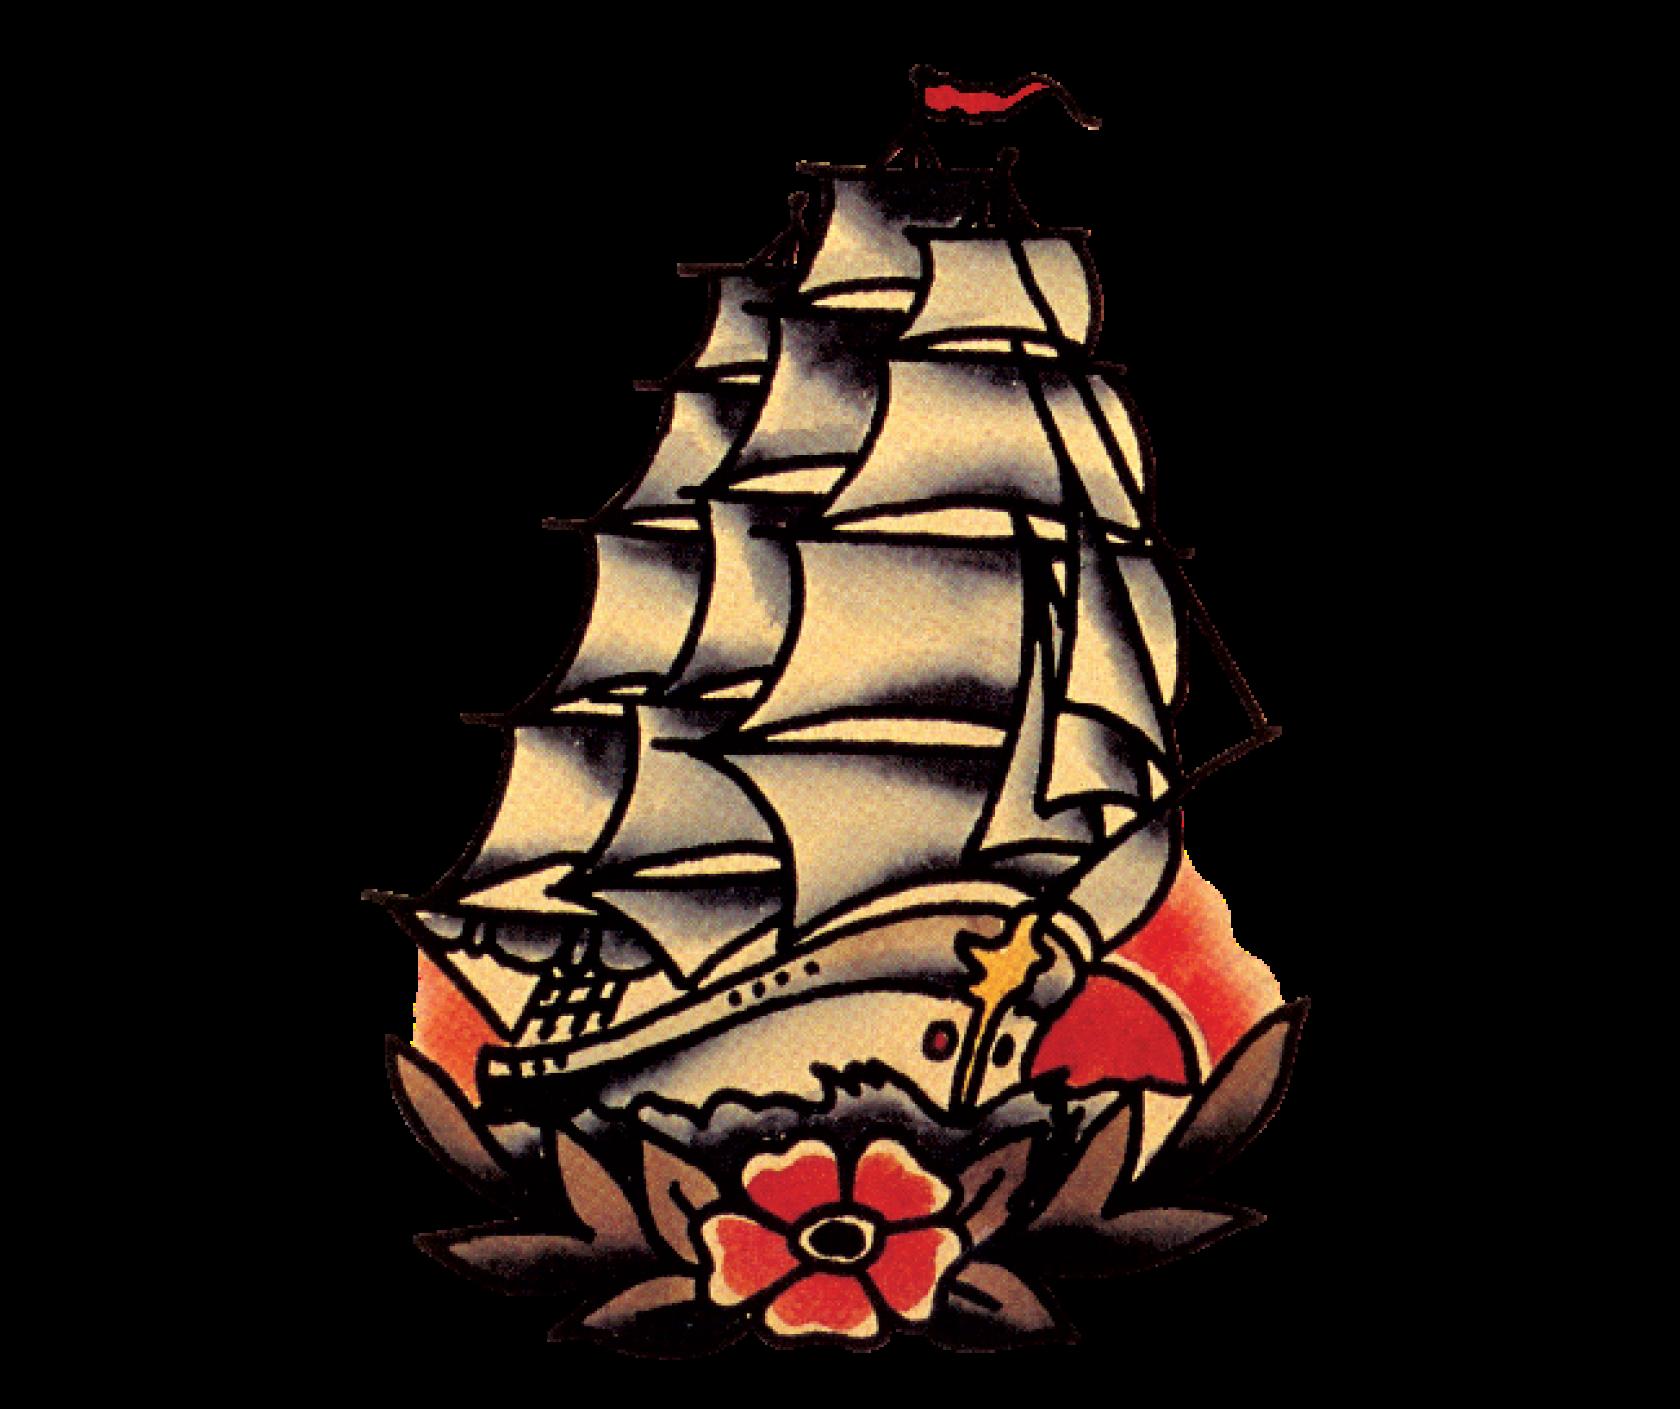 Old ship sun clipart clipart transparent download Home - windedvoyage.com clipart transparent download